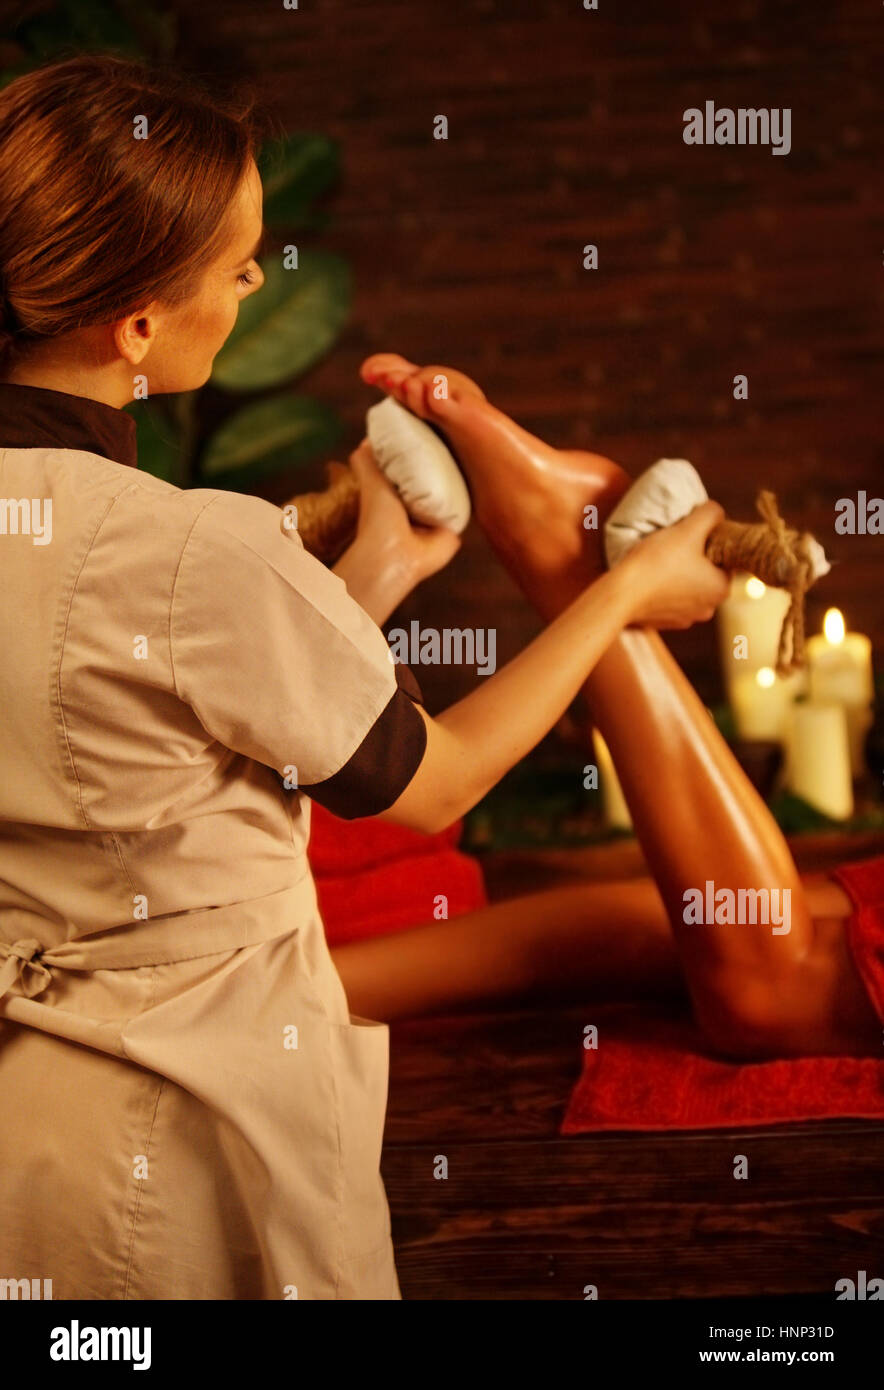 Feet massage with Thai reflexology. Cropped shot of foot reflexology. Stock Photo